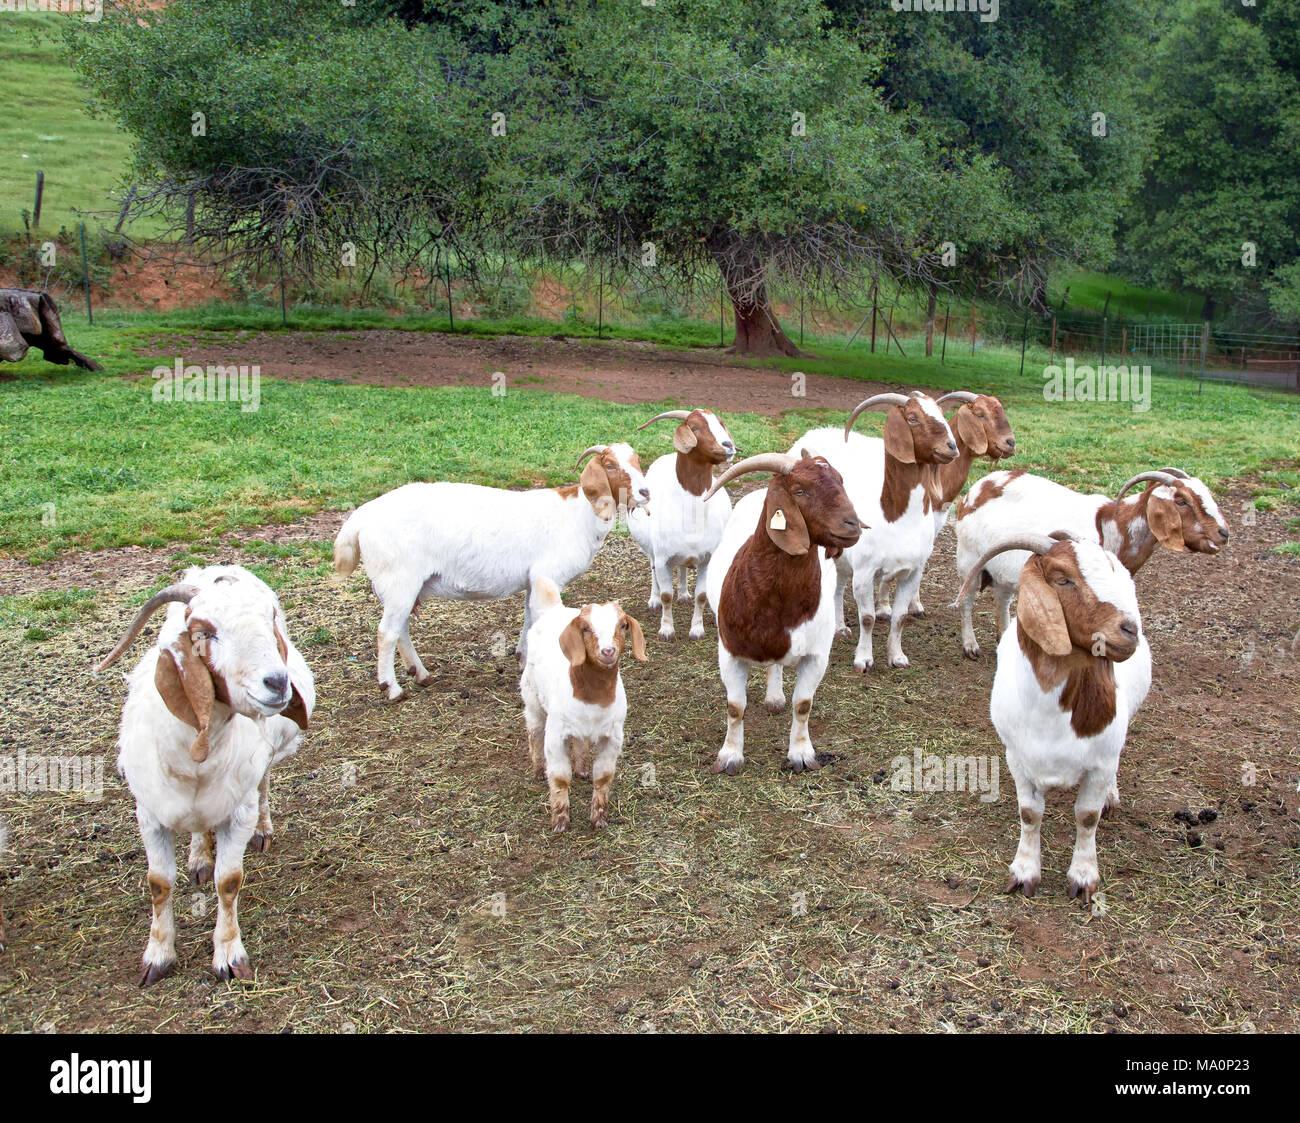 Female Boer Goats  'Capra aegagrus hircus' gathered in area adjoining the barn, waiting to be fed. - Stock Image